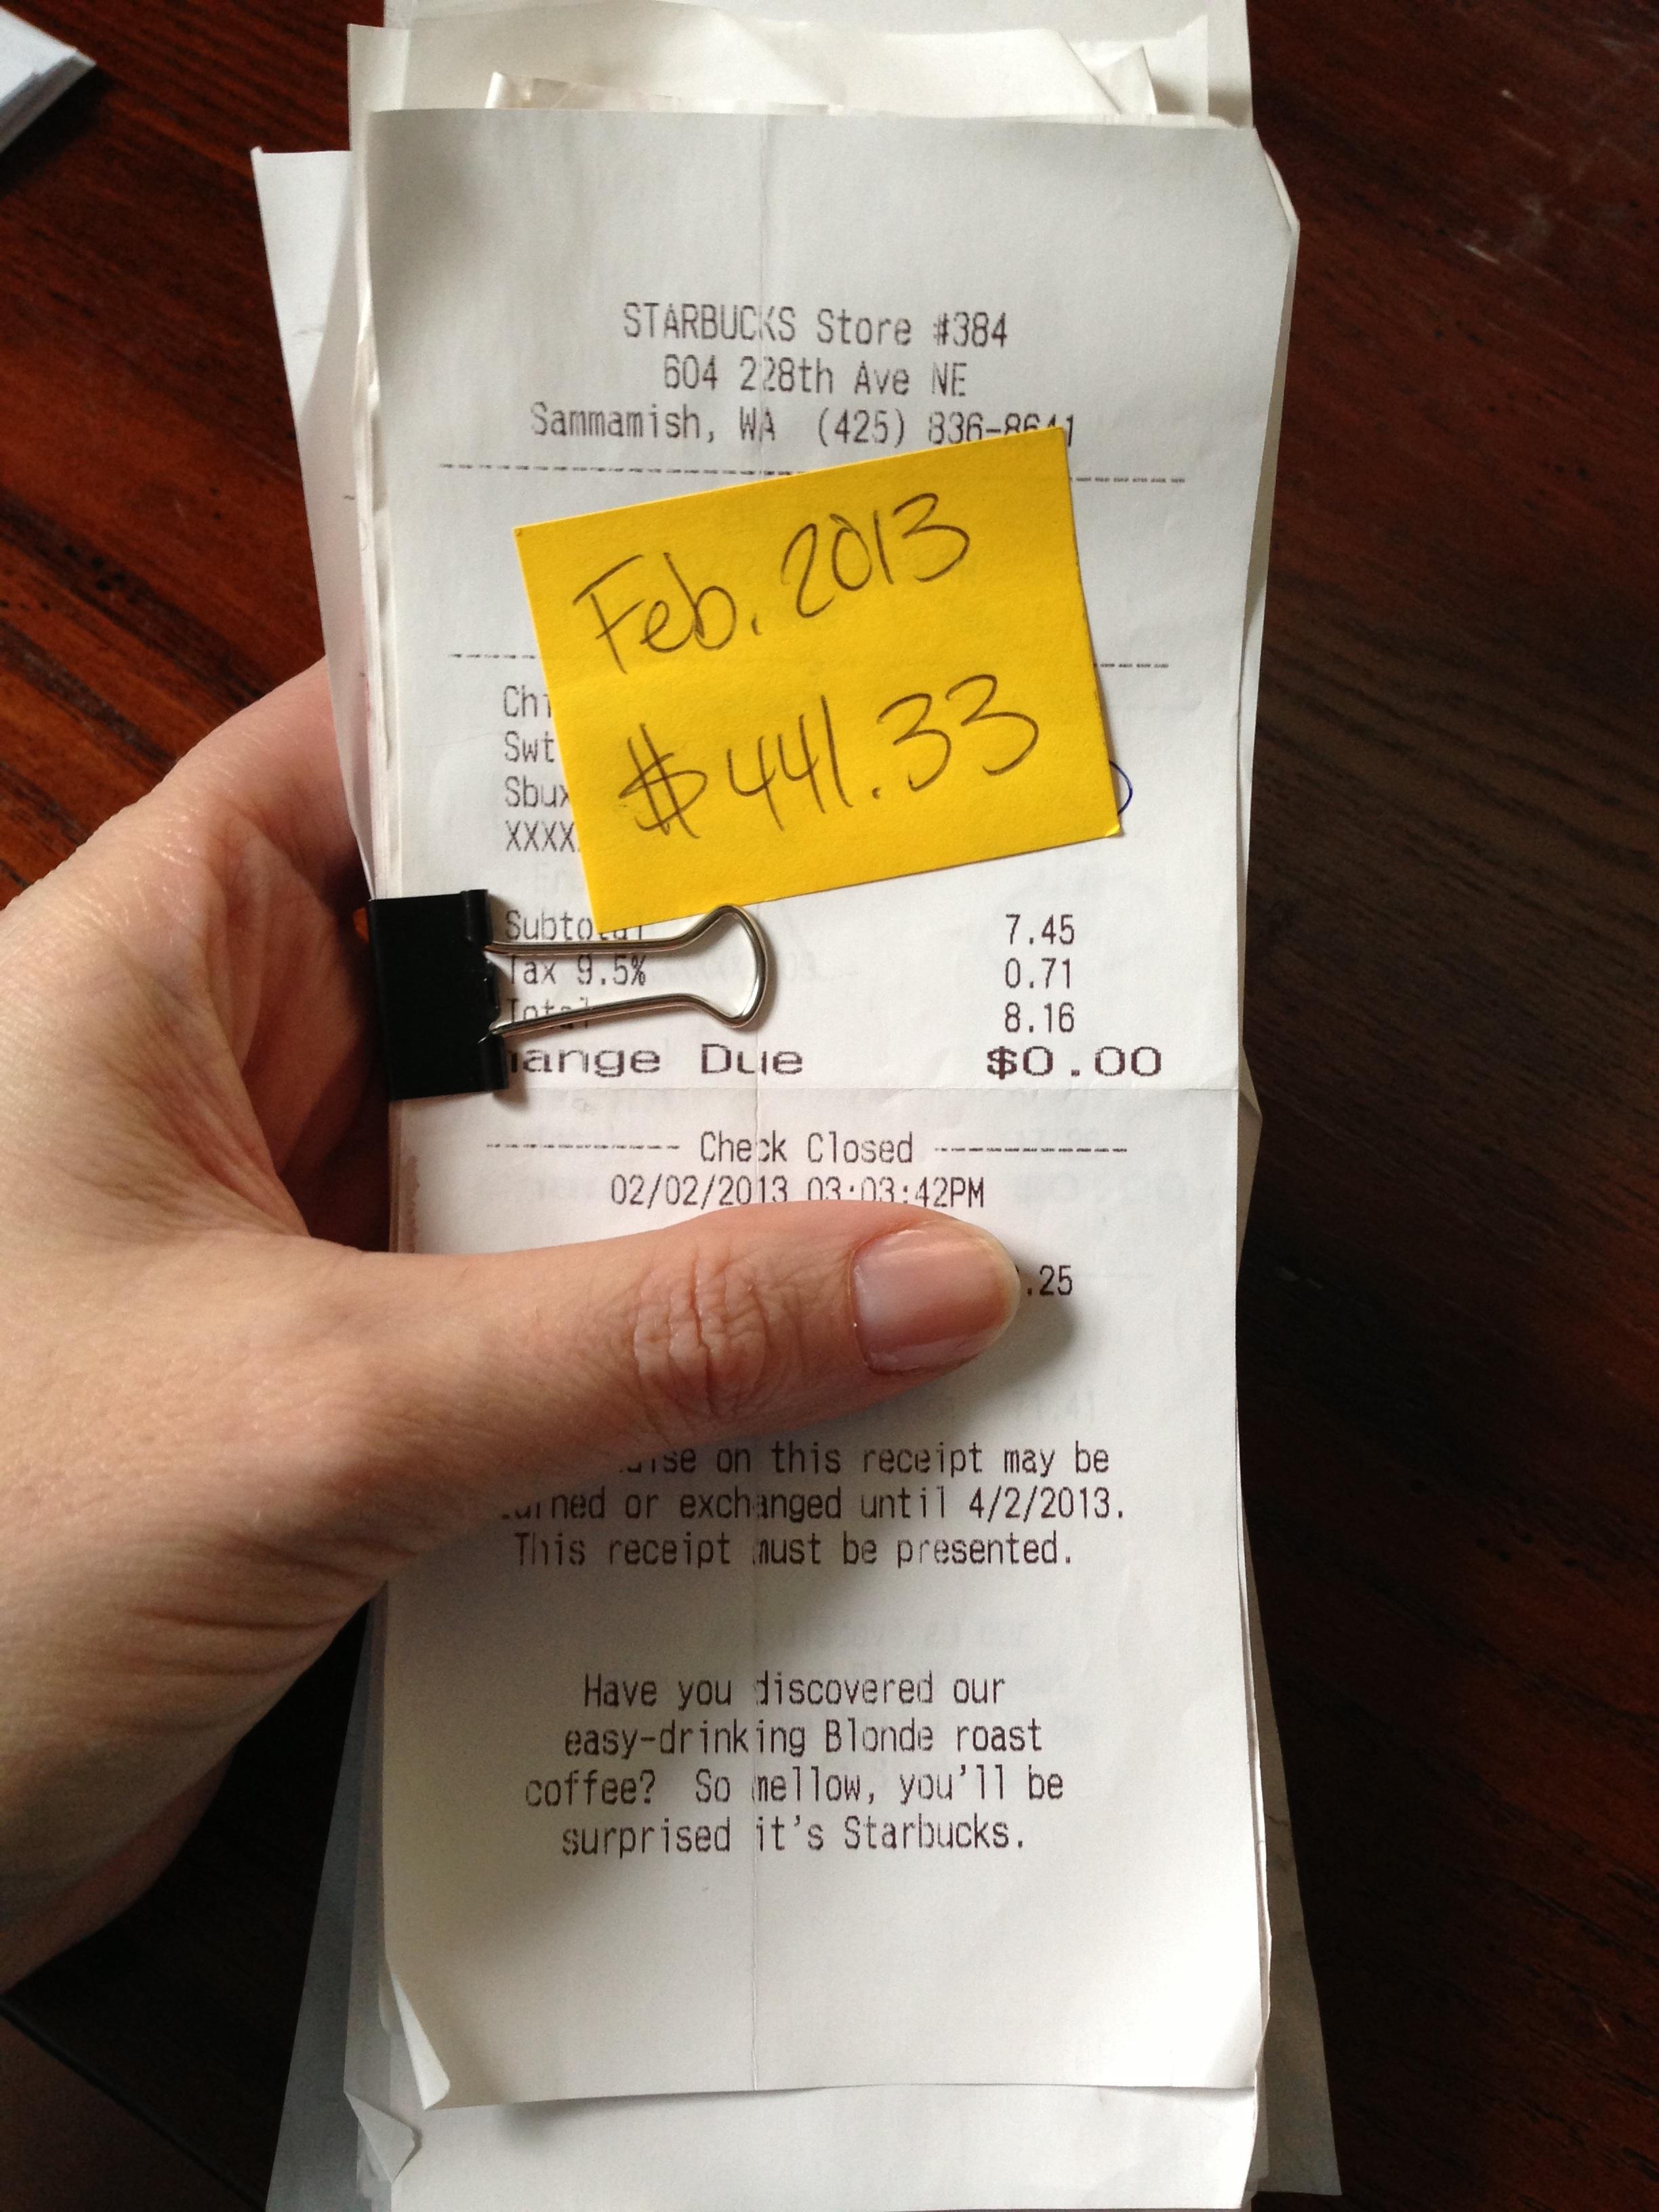 February Starbucks receipts